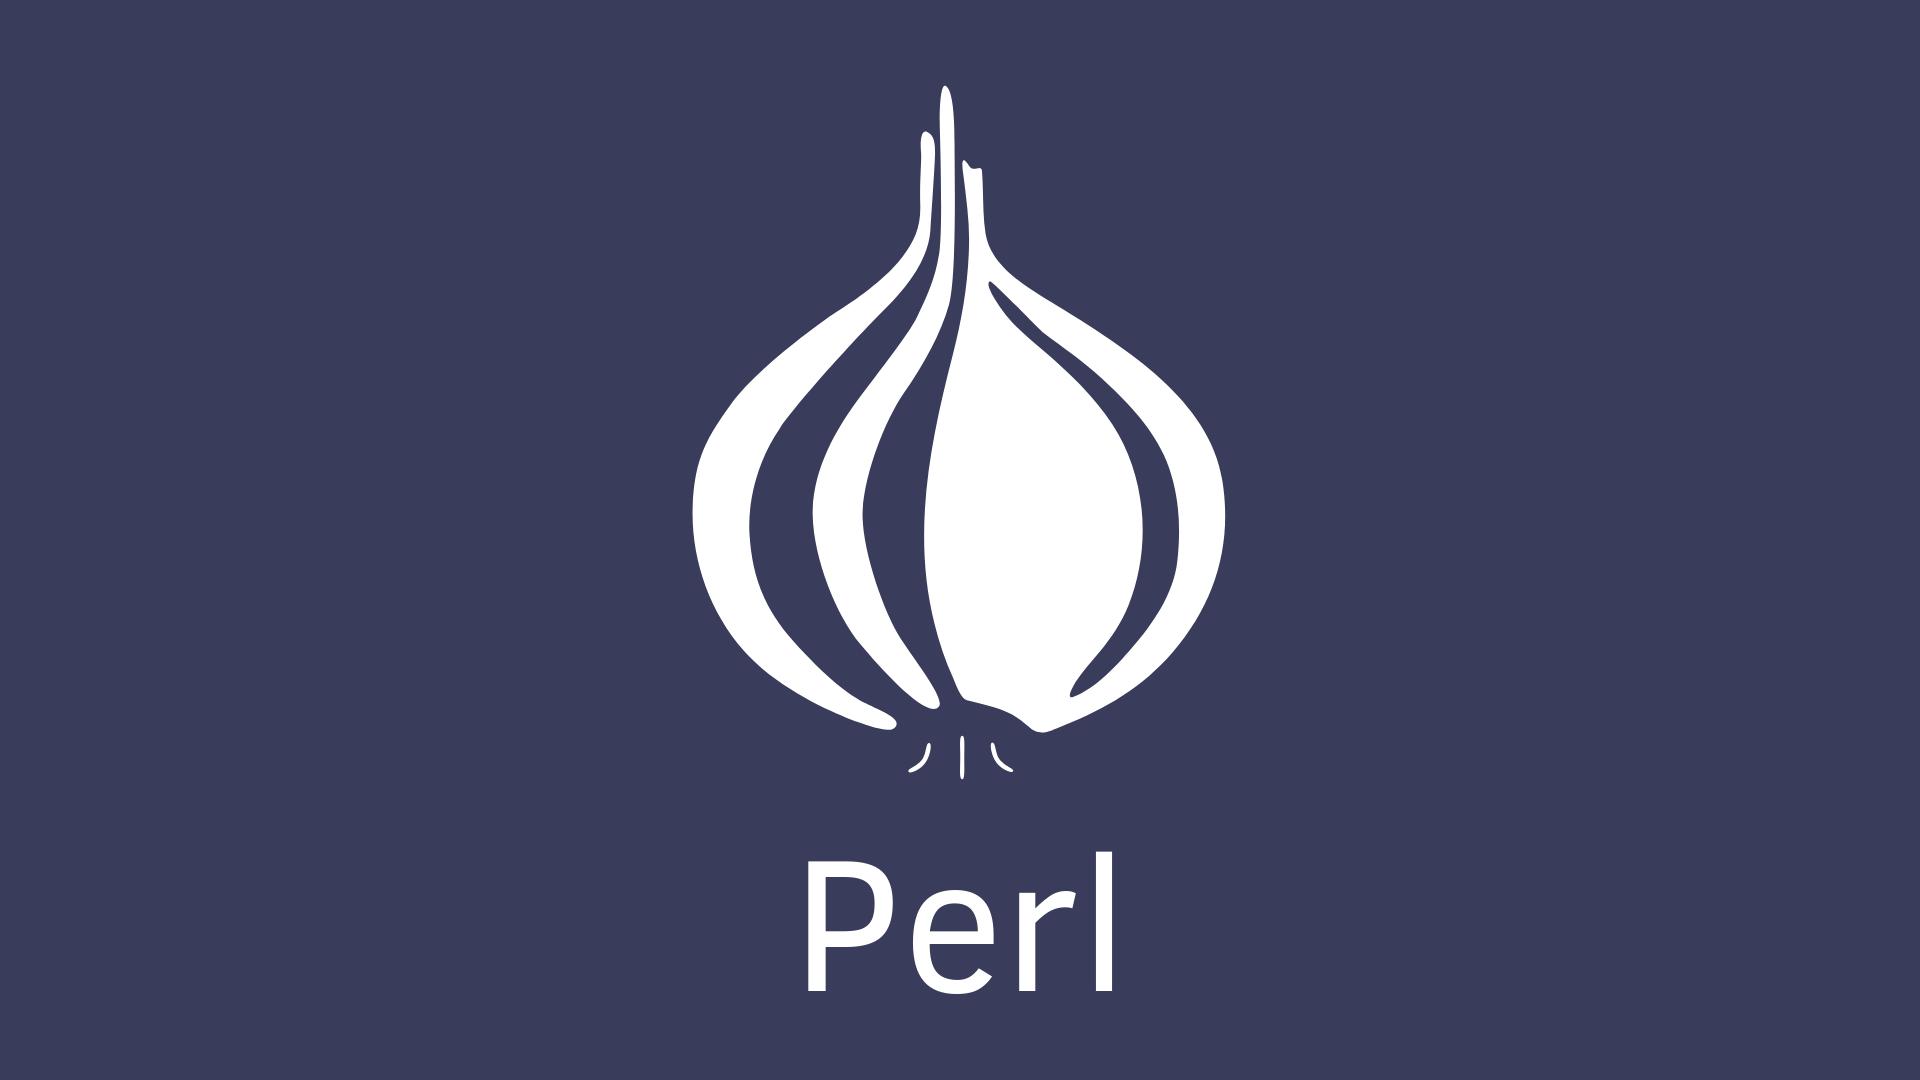 Perl プログラミング